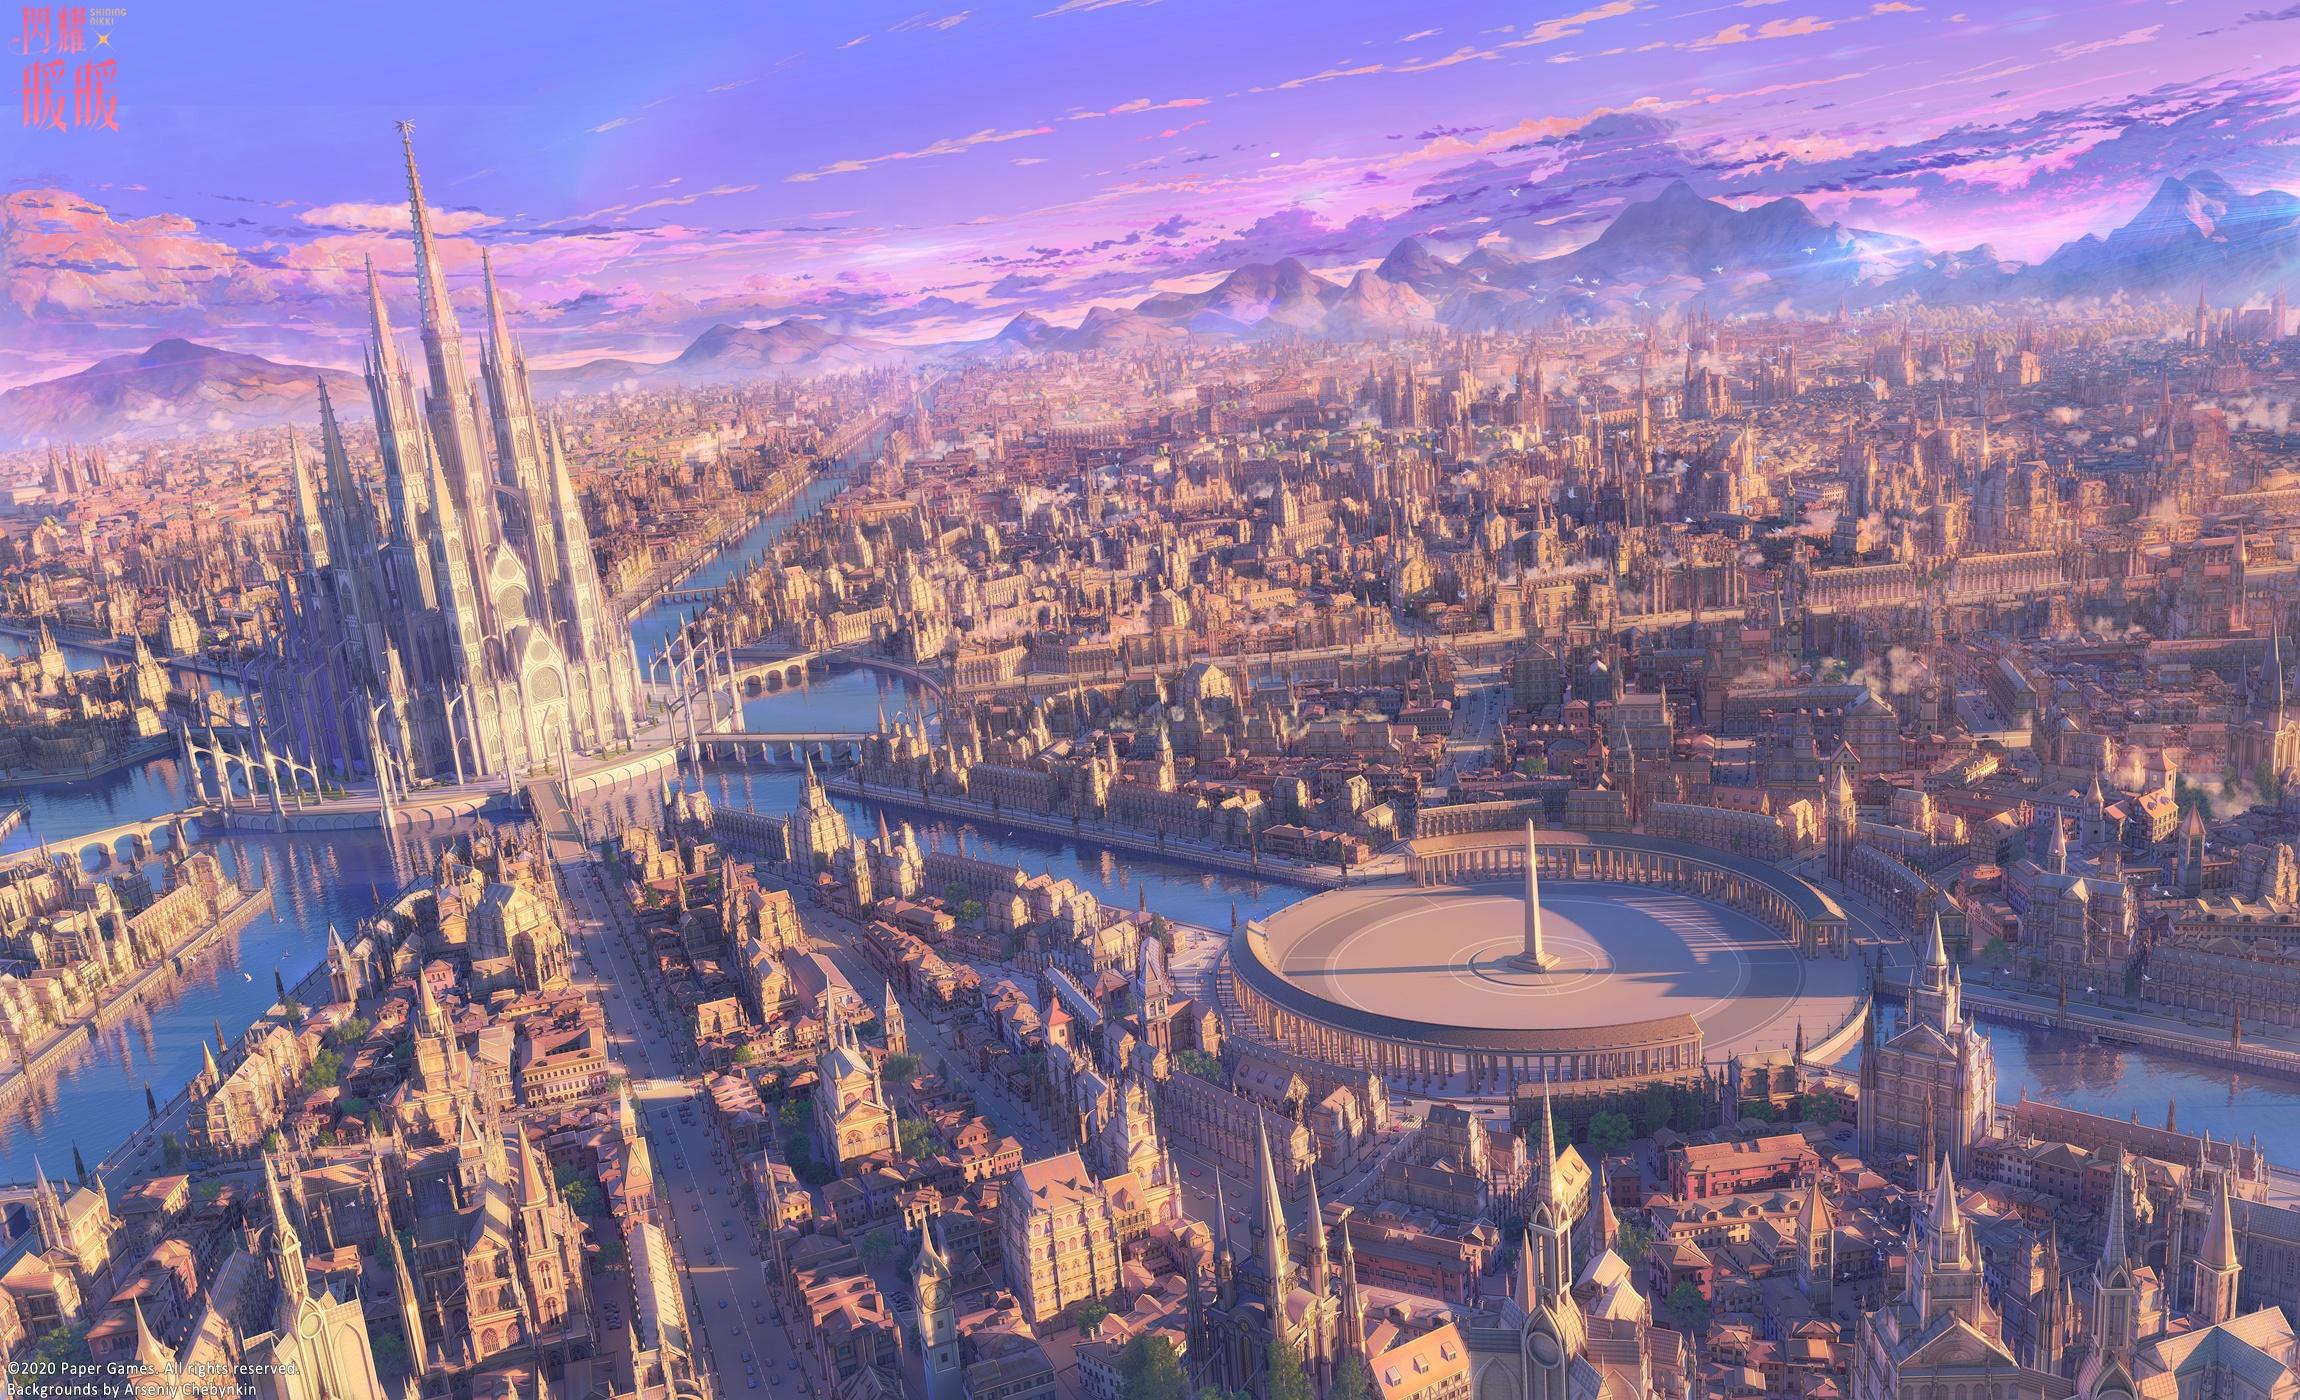 Anime City laptop wallpaper